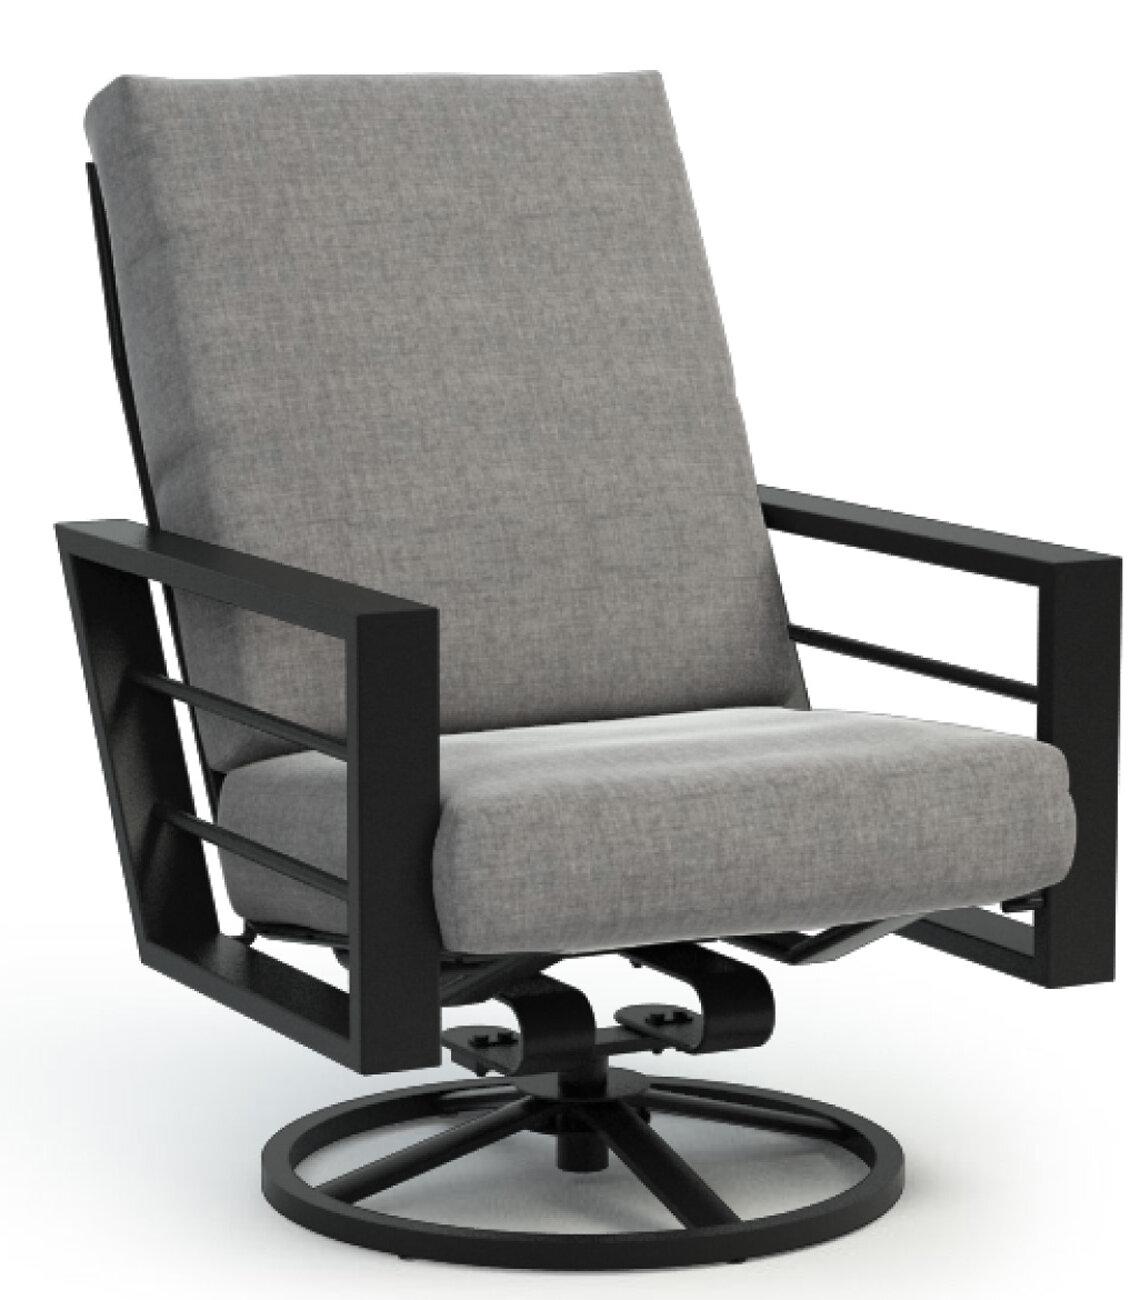 Patio Chair With Sunbrella Cushions